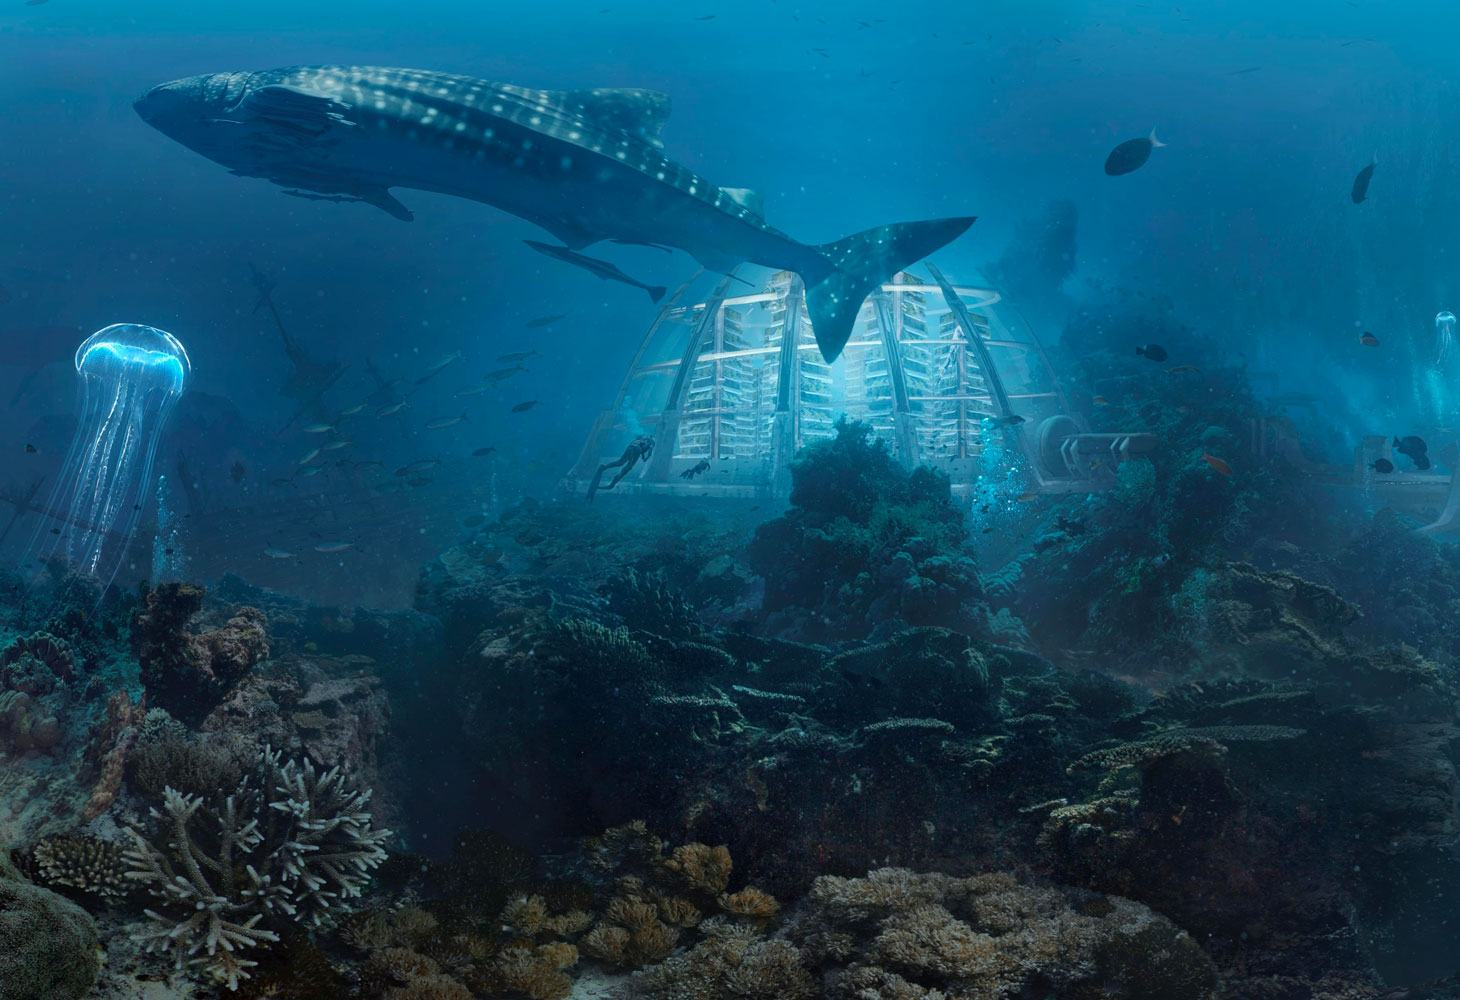 Underwater city on Earth 2050